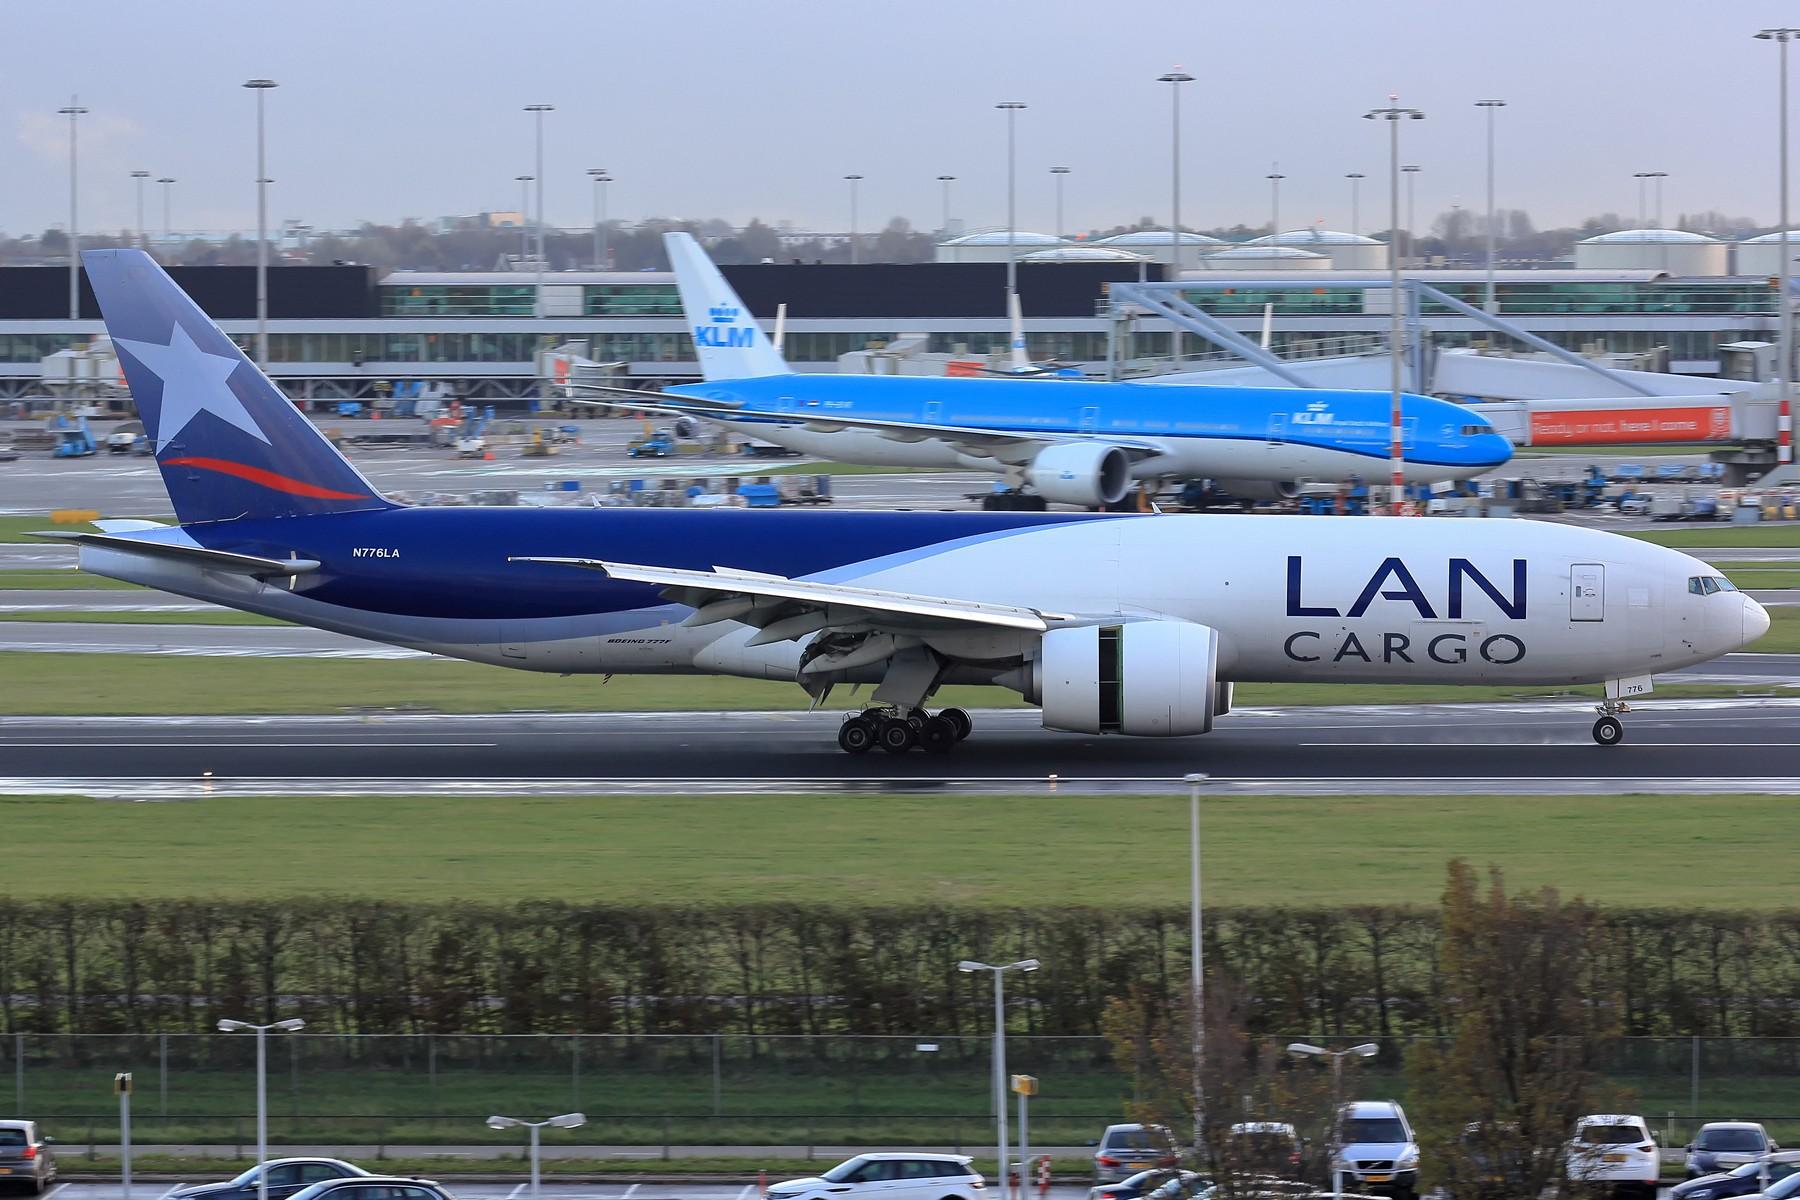 Re:[原创]【AMS】伪塔台视角吹水几张 1800大图 BOEING 777-200 N776LA 荷兰阿姆斯特丹史基浦机场